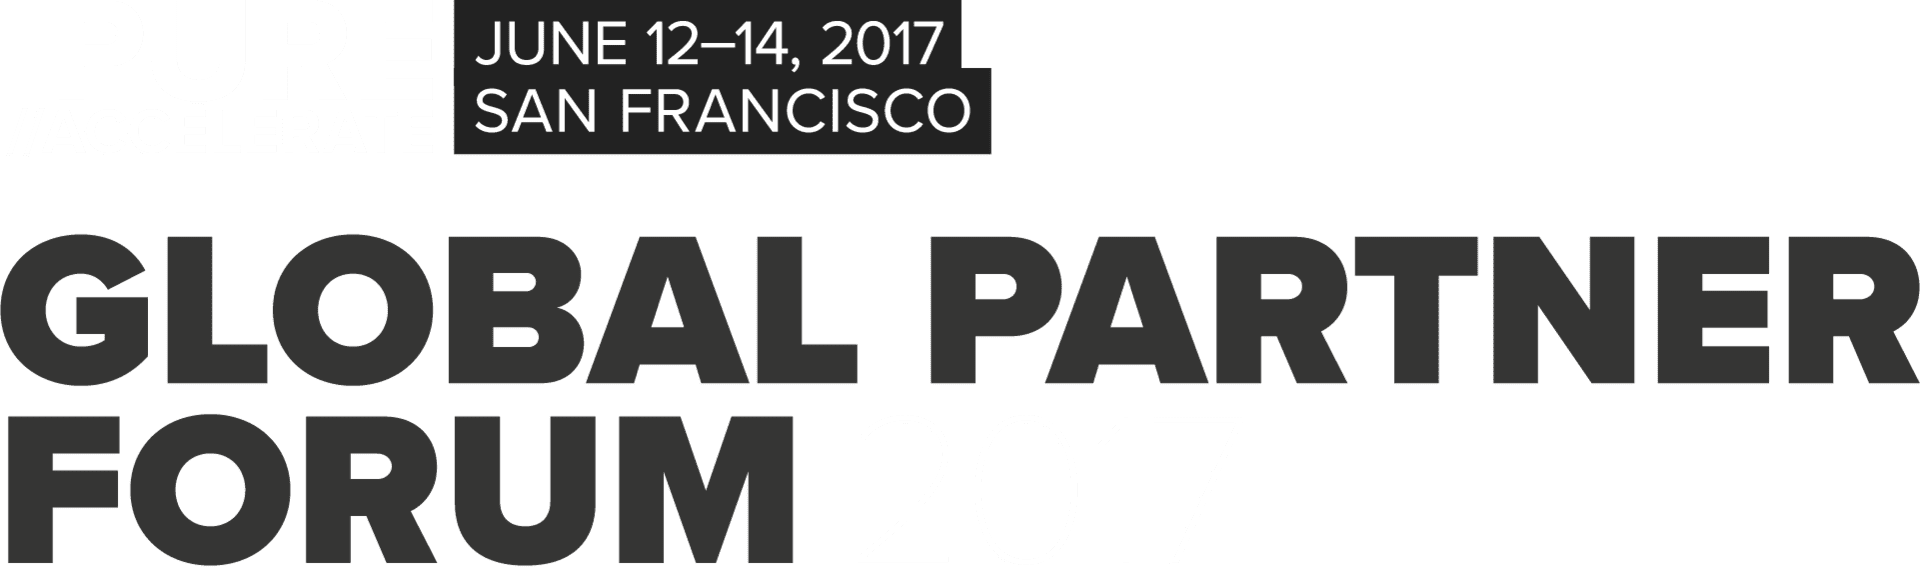 Pure Accelerate 2017: Global Partner Forum | Pure Storage